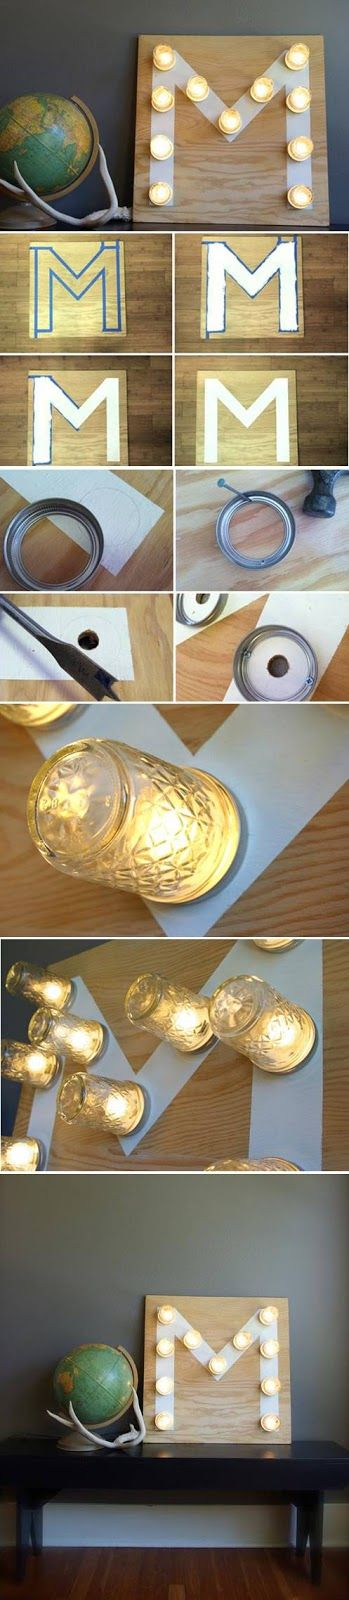 DIY : Decorative Jar Light